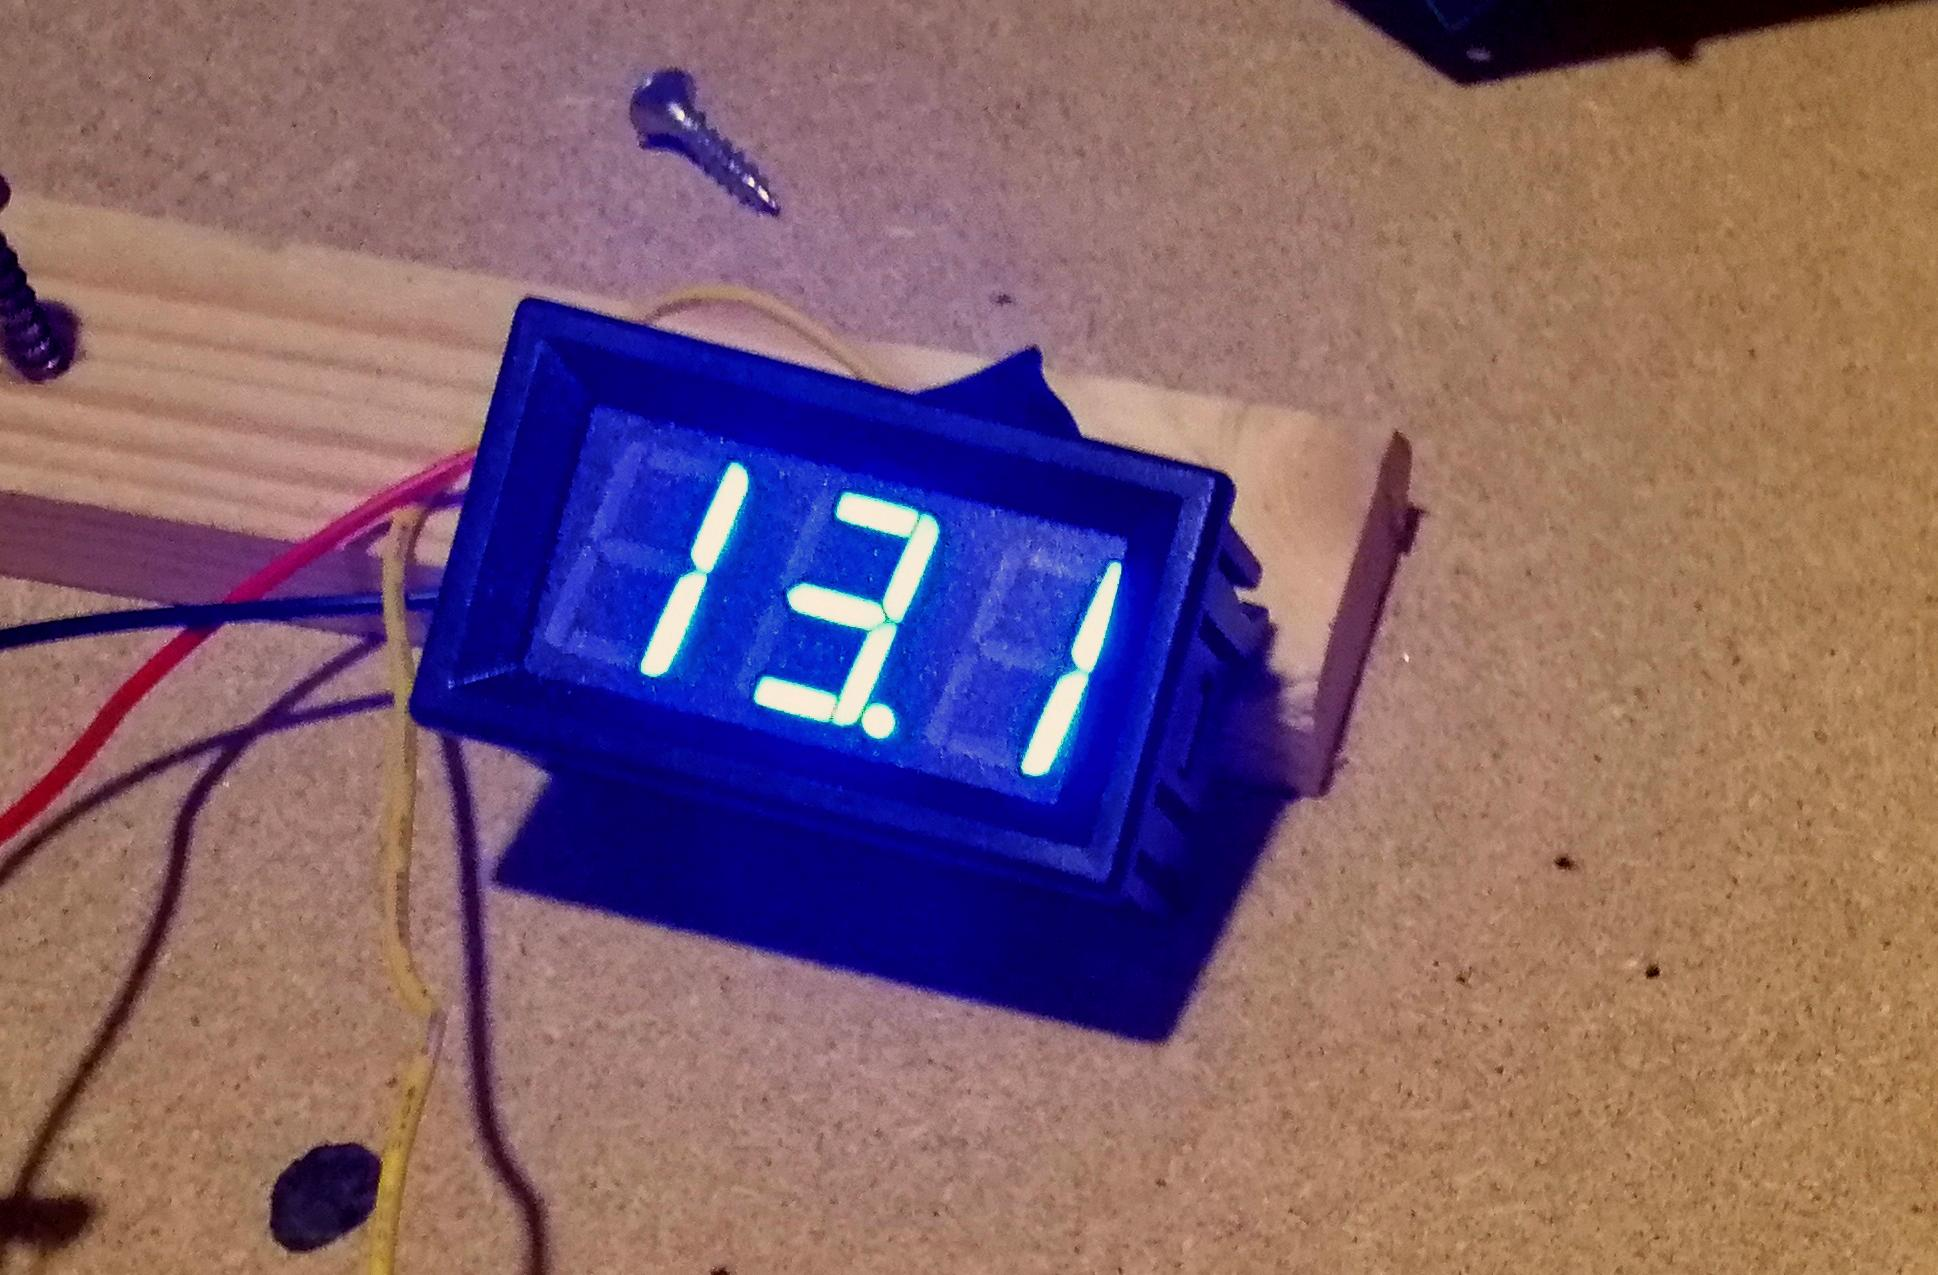 Voltmetro per l'alimentatore variabile